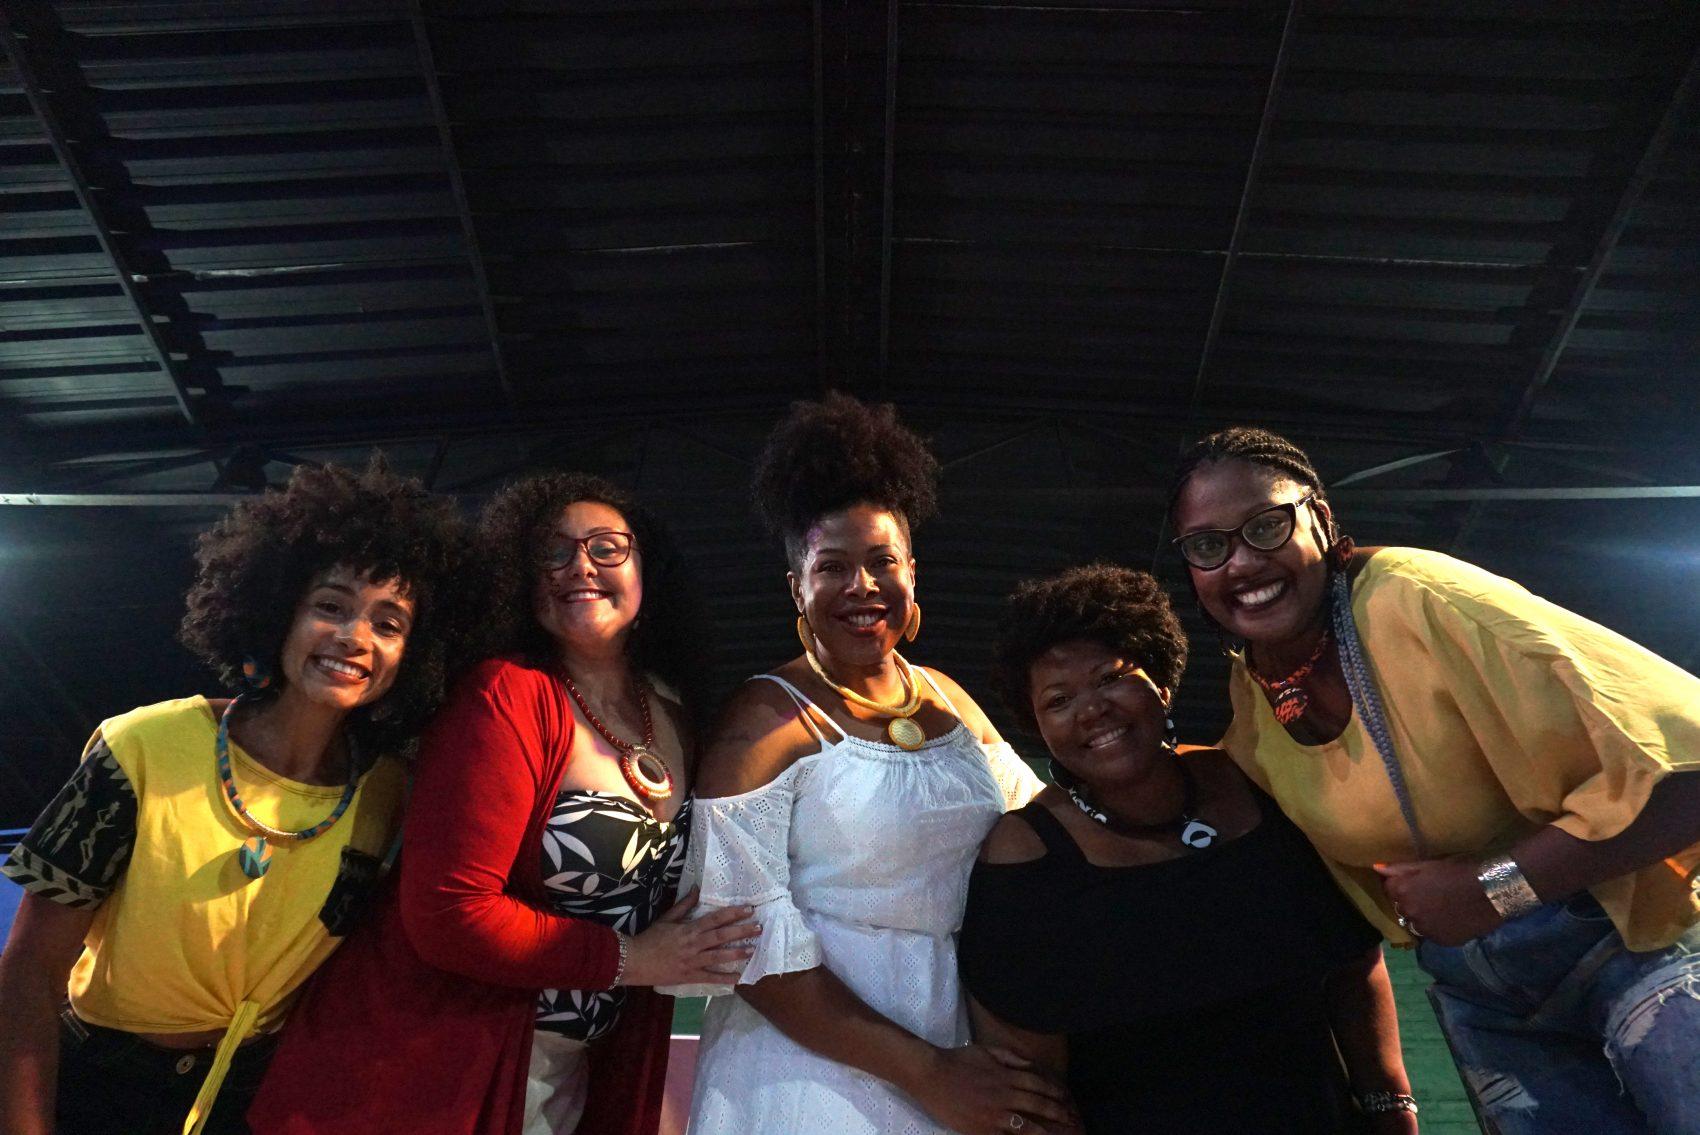 Vanessa dos Santos, Ana Carolina dos Santos, Helena Meirelles, Janaína Barbosa da Silva e Cristina Centeno